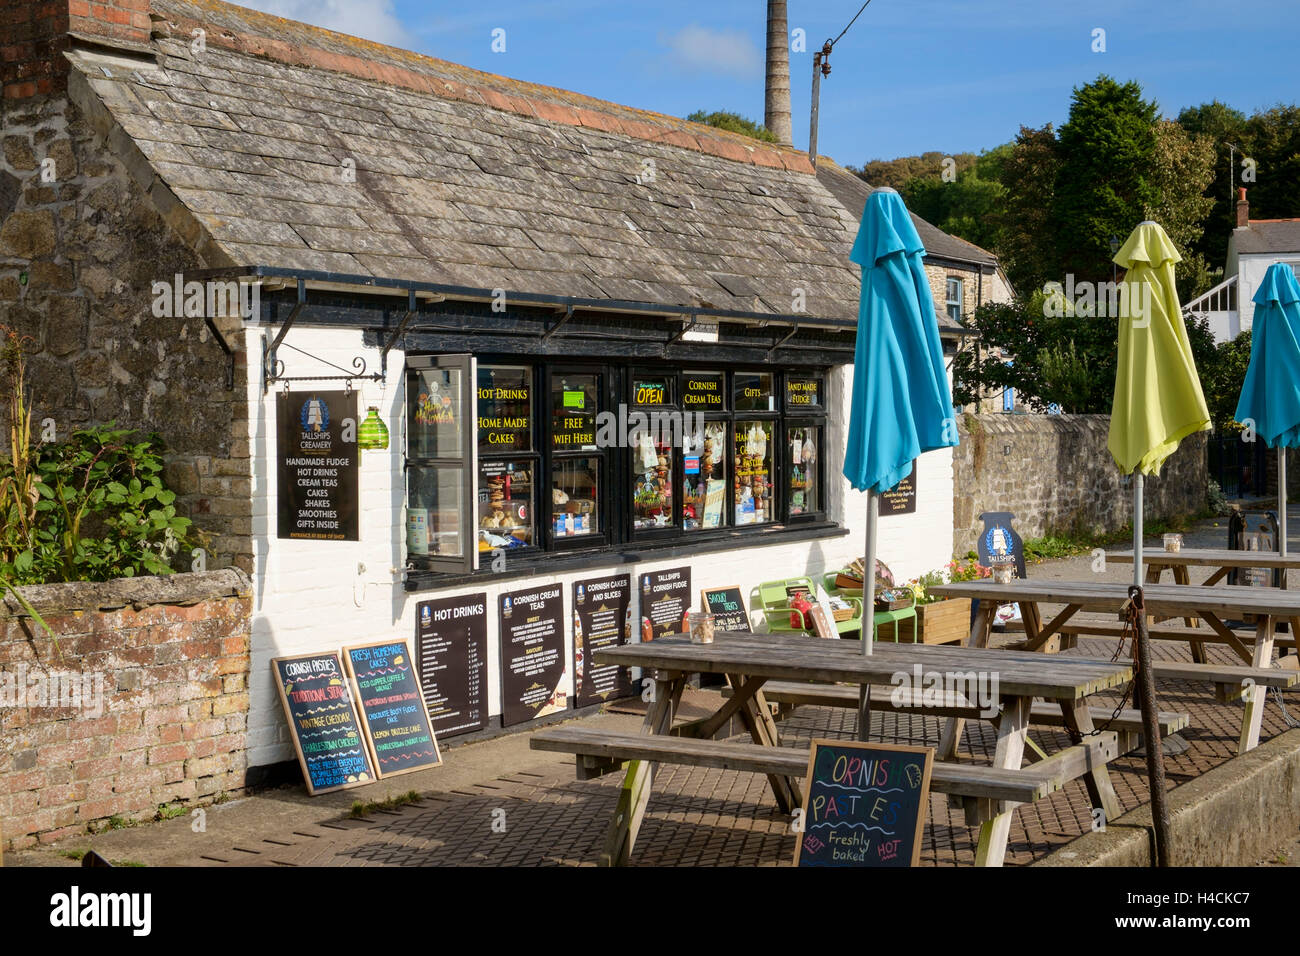 Old weighbridge building now a tea room and tea shop, Charlestown, Cornwall, England, UK - Stock Image